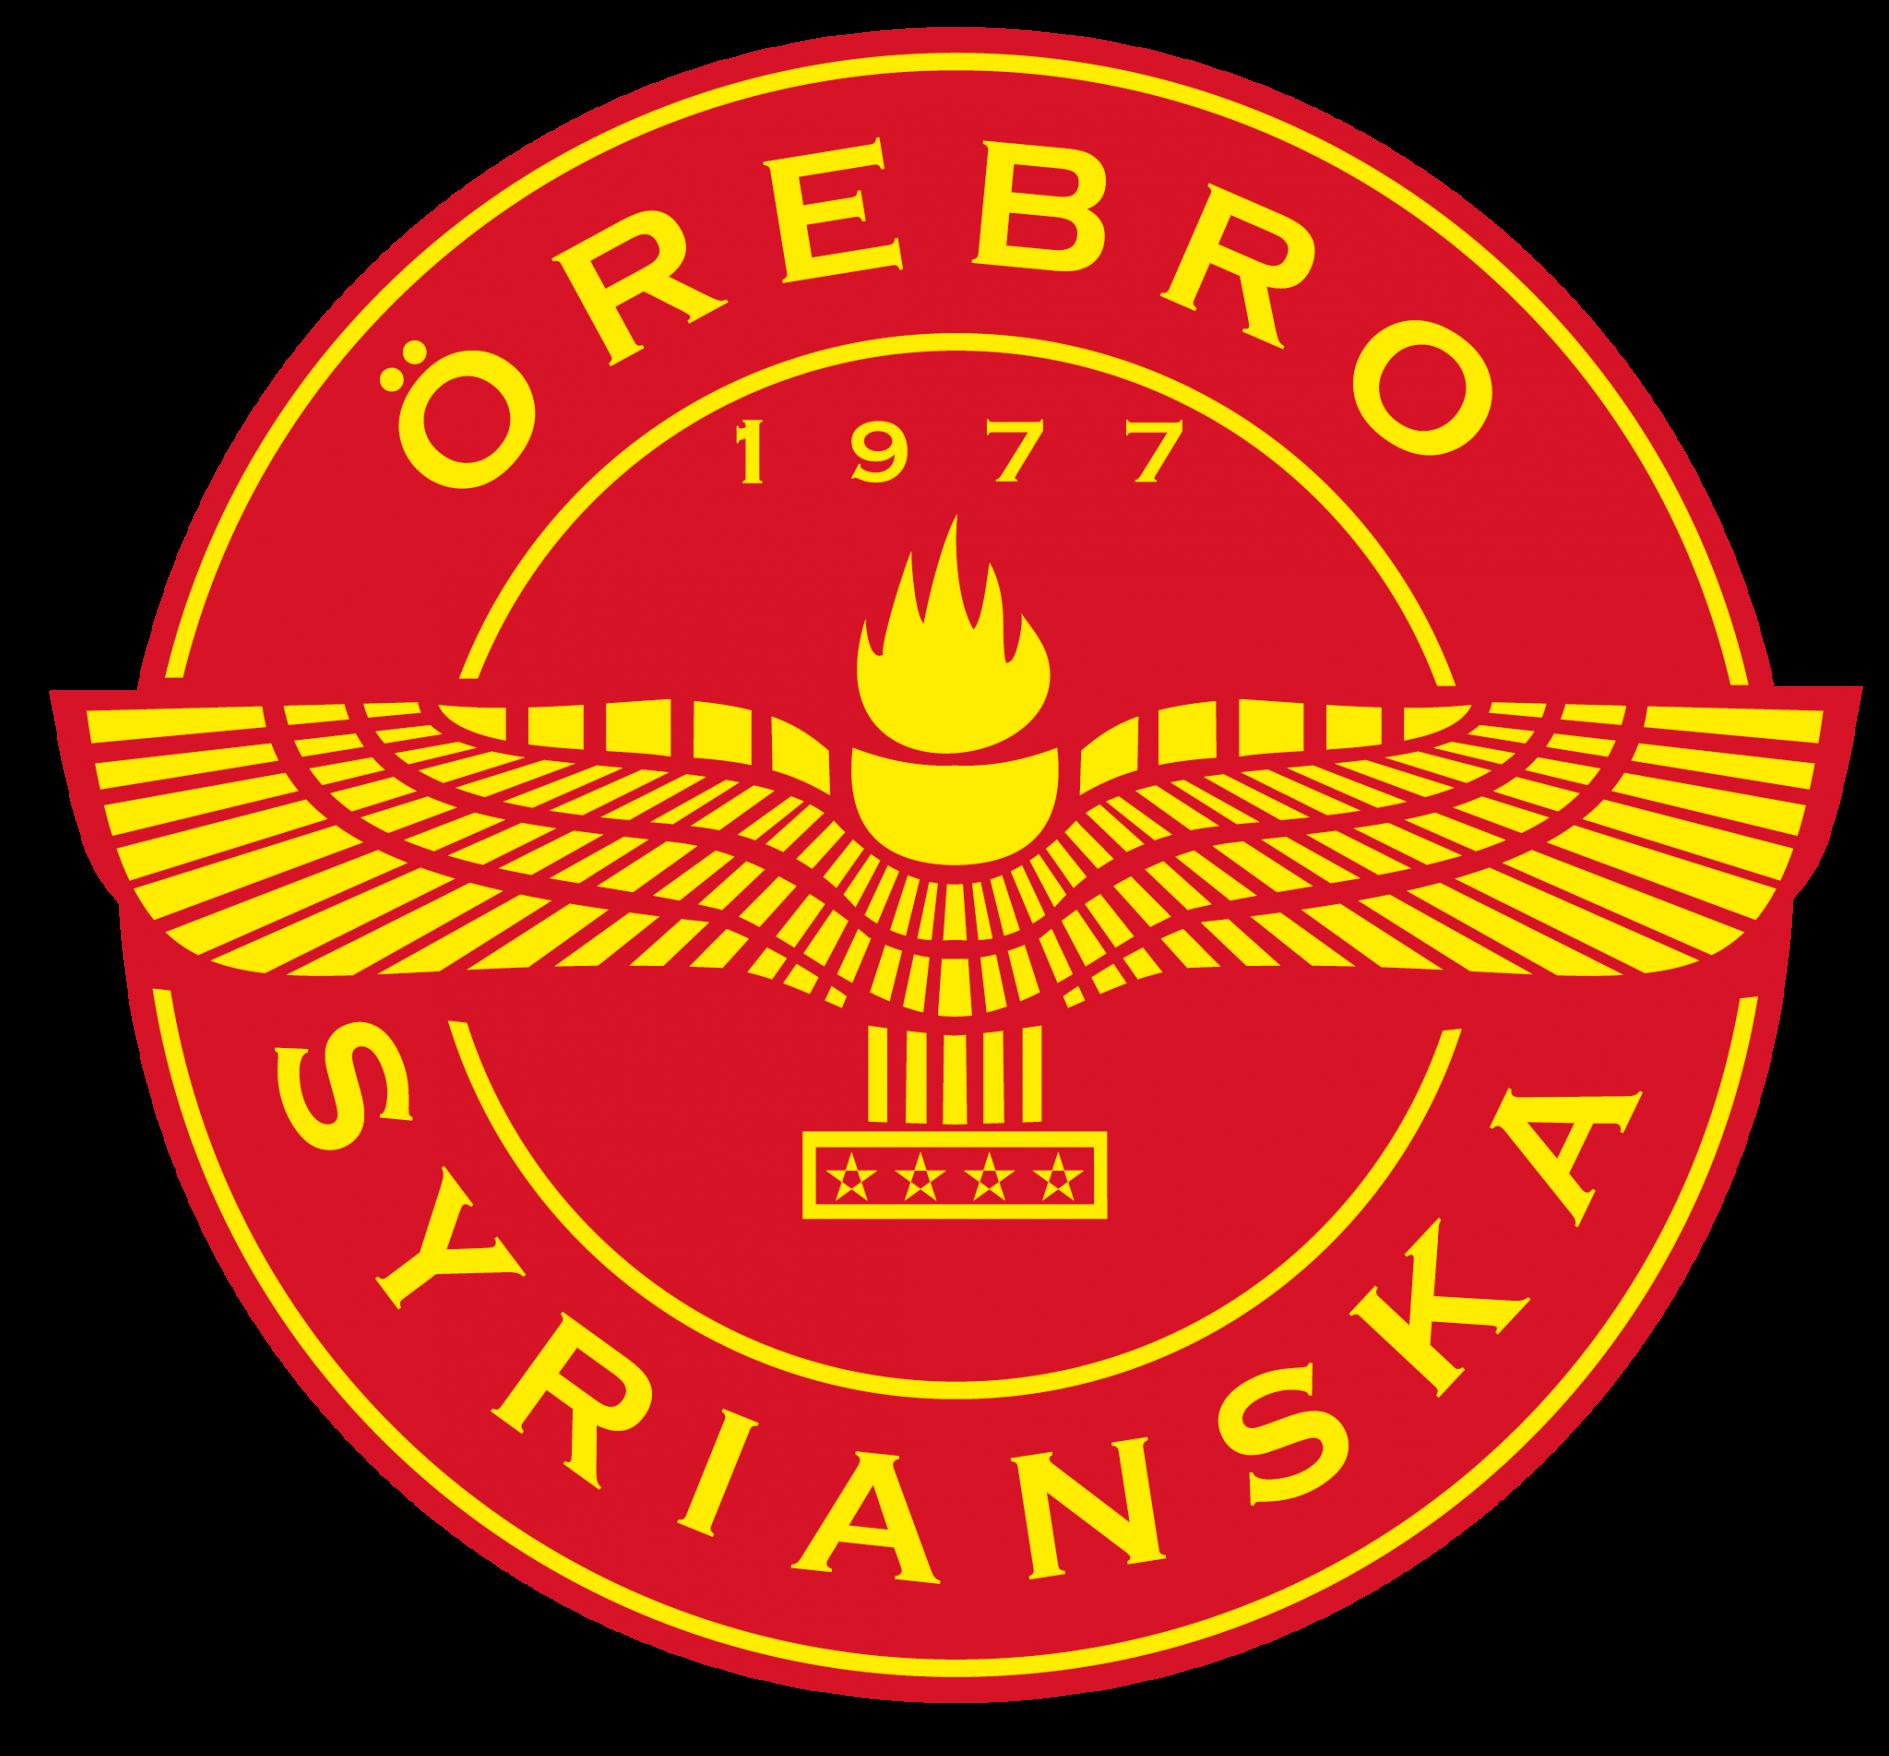 Orebro Syrianska team logo